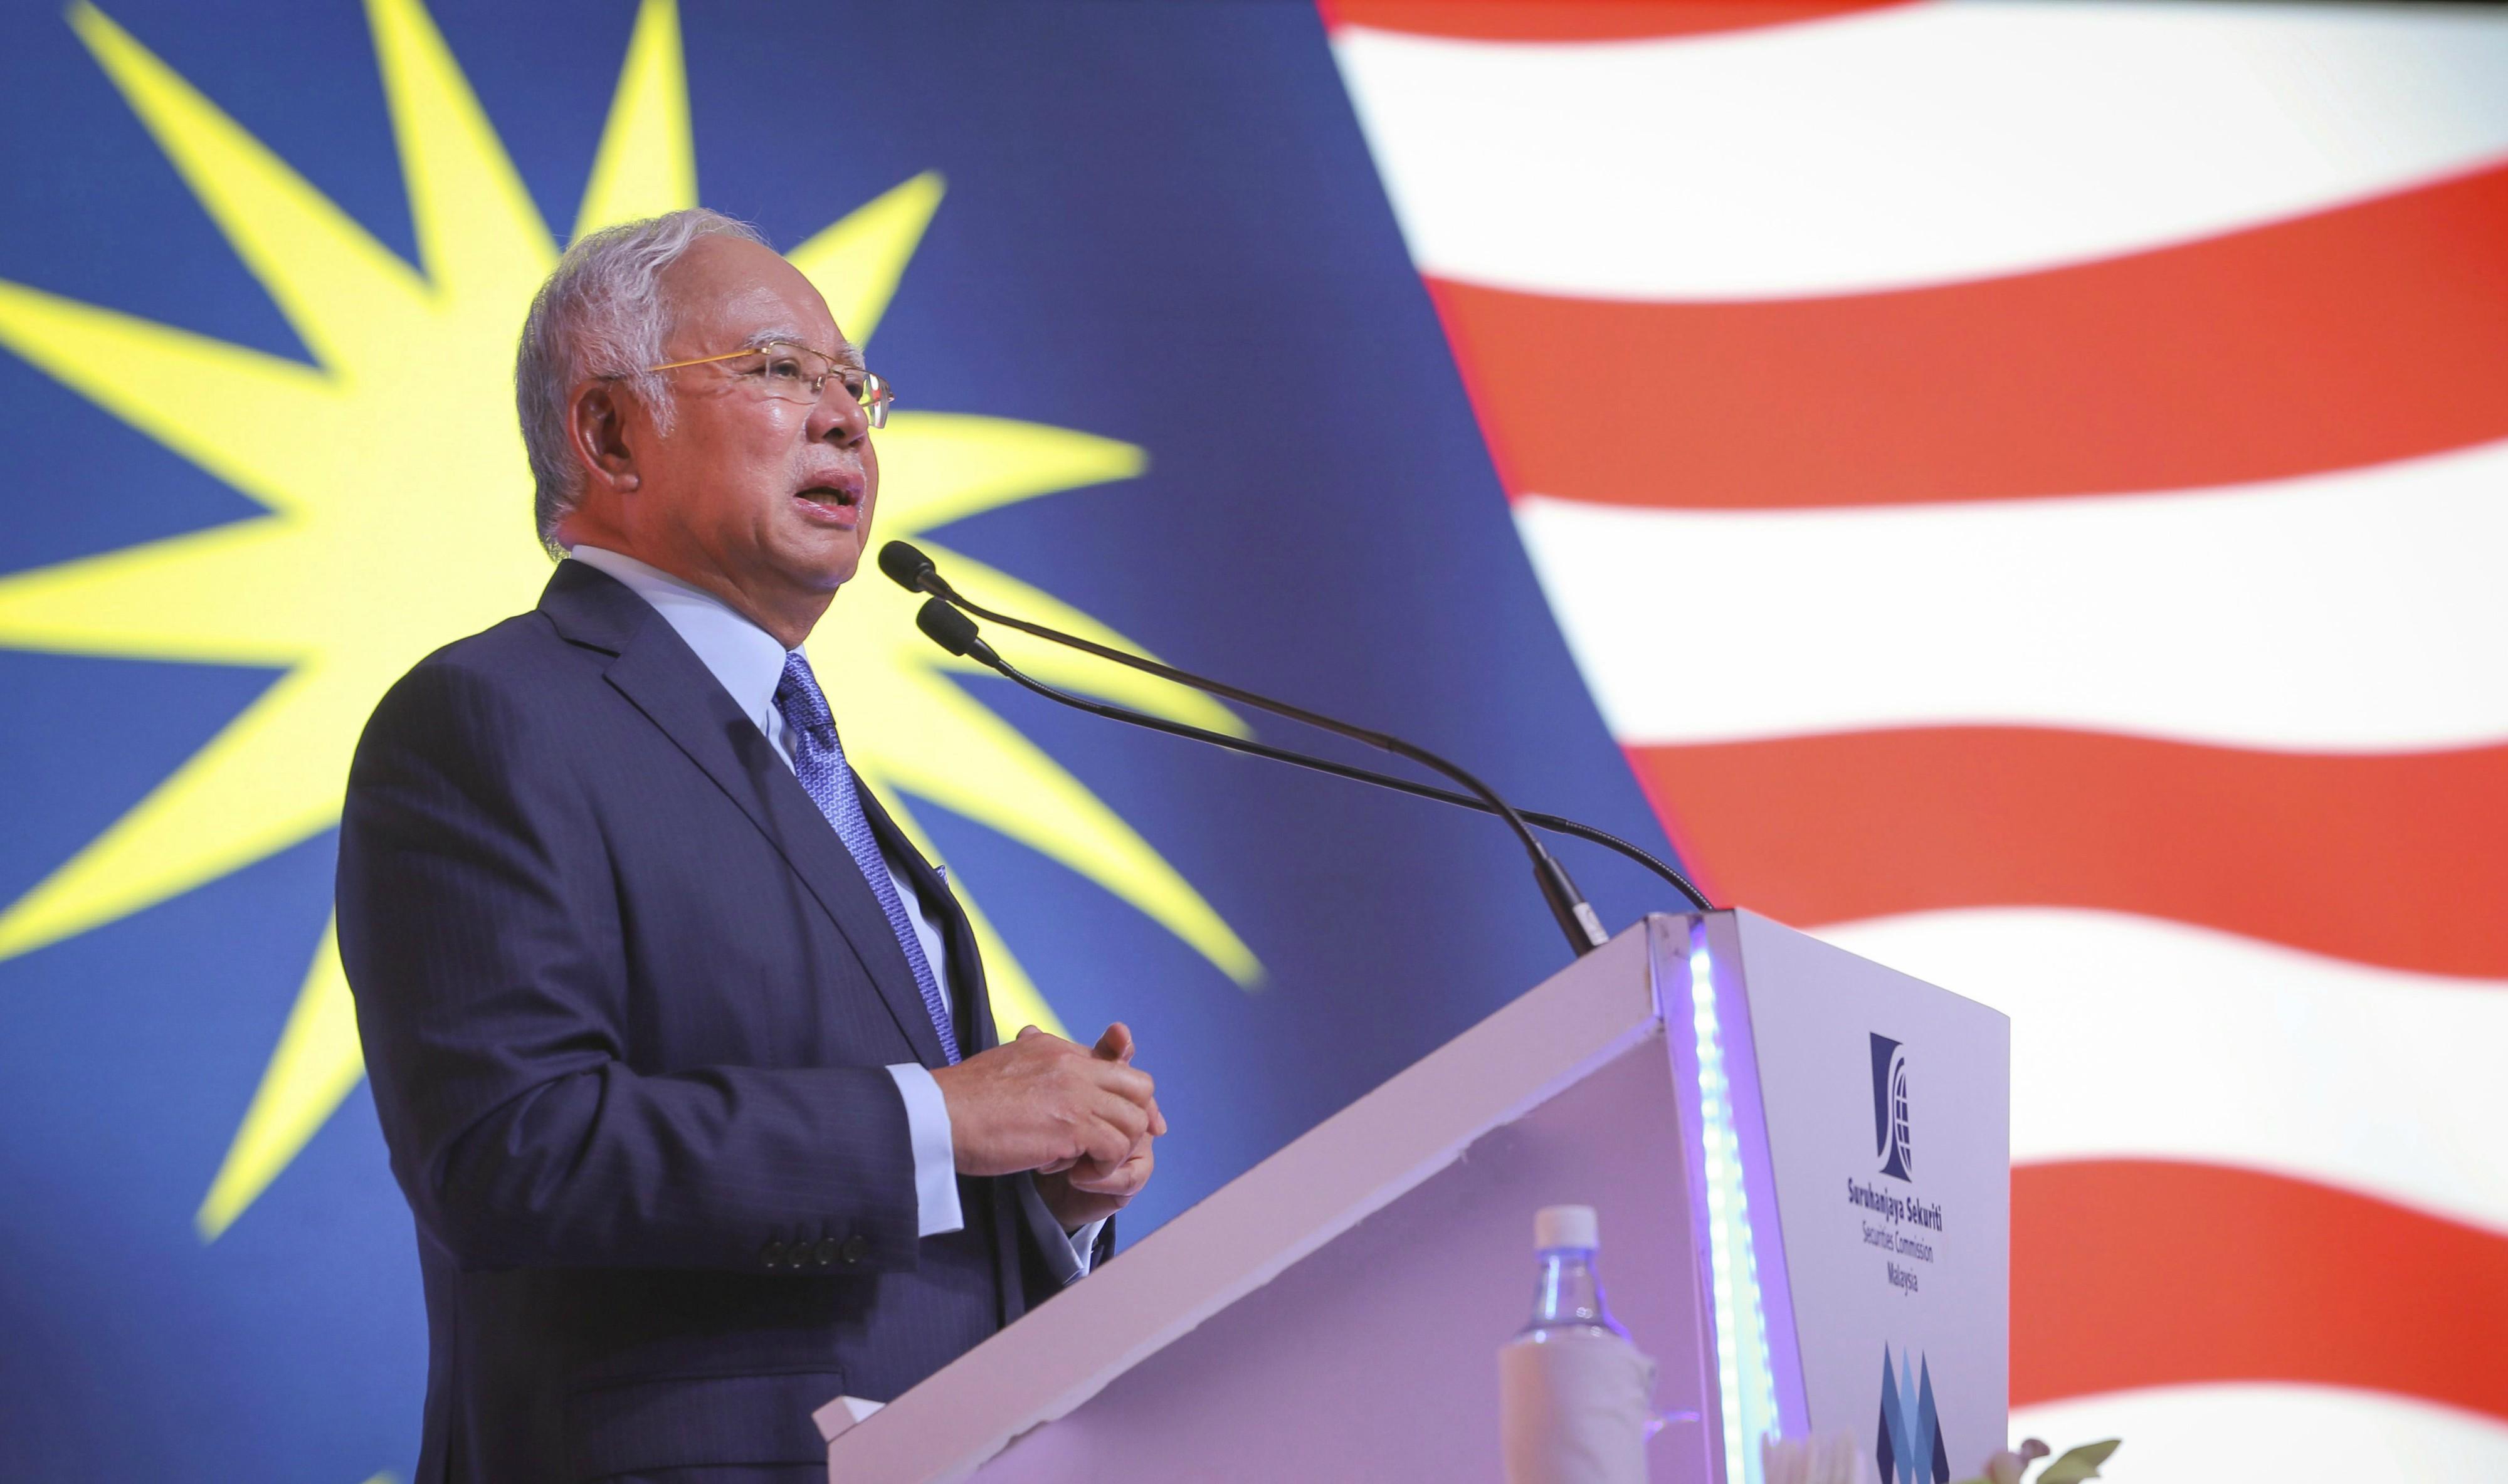 Malaysia's Prime Minister Najib Razak speaks in Kuala Lumpur, Malaysia in February 2018. (AP Photo/Vincent Thian)